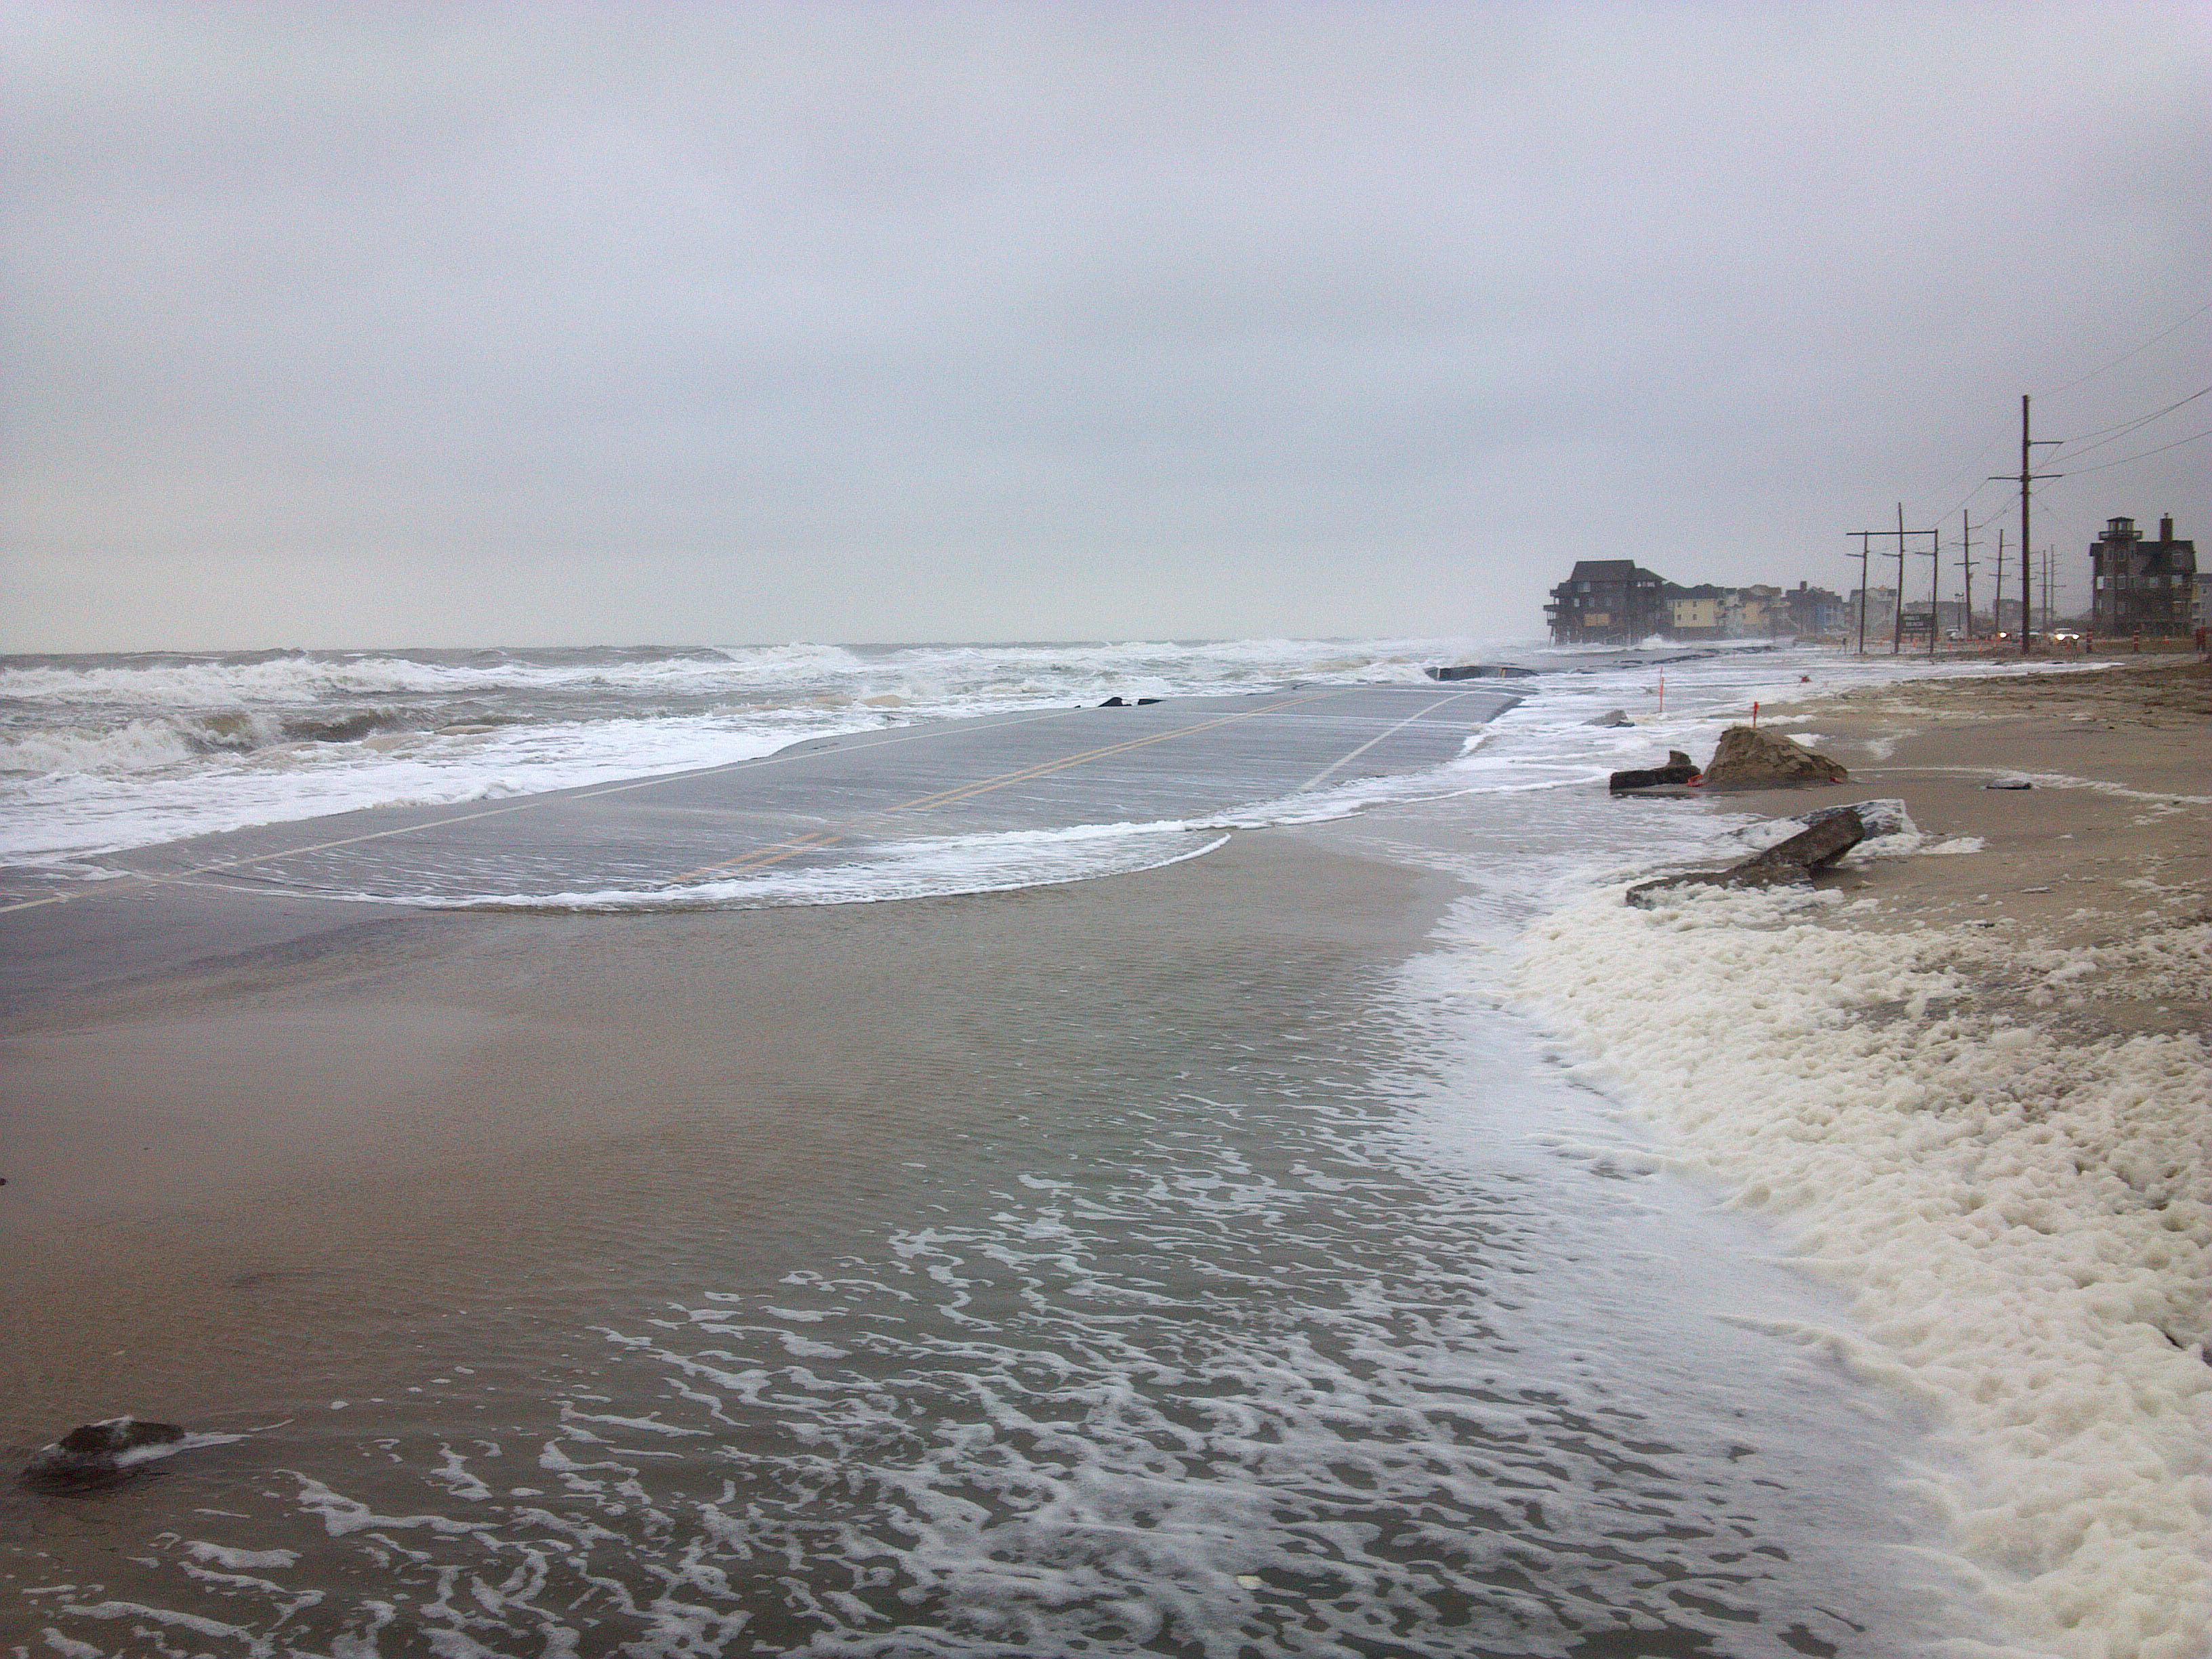 north carolina u0026 39 s outer banks struggle with flooding